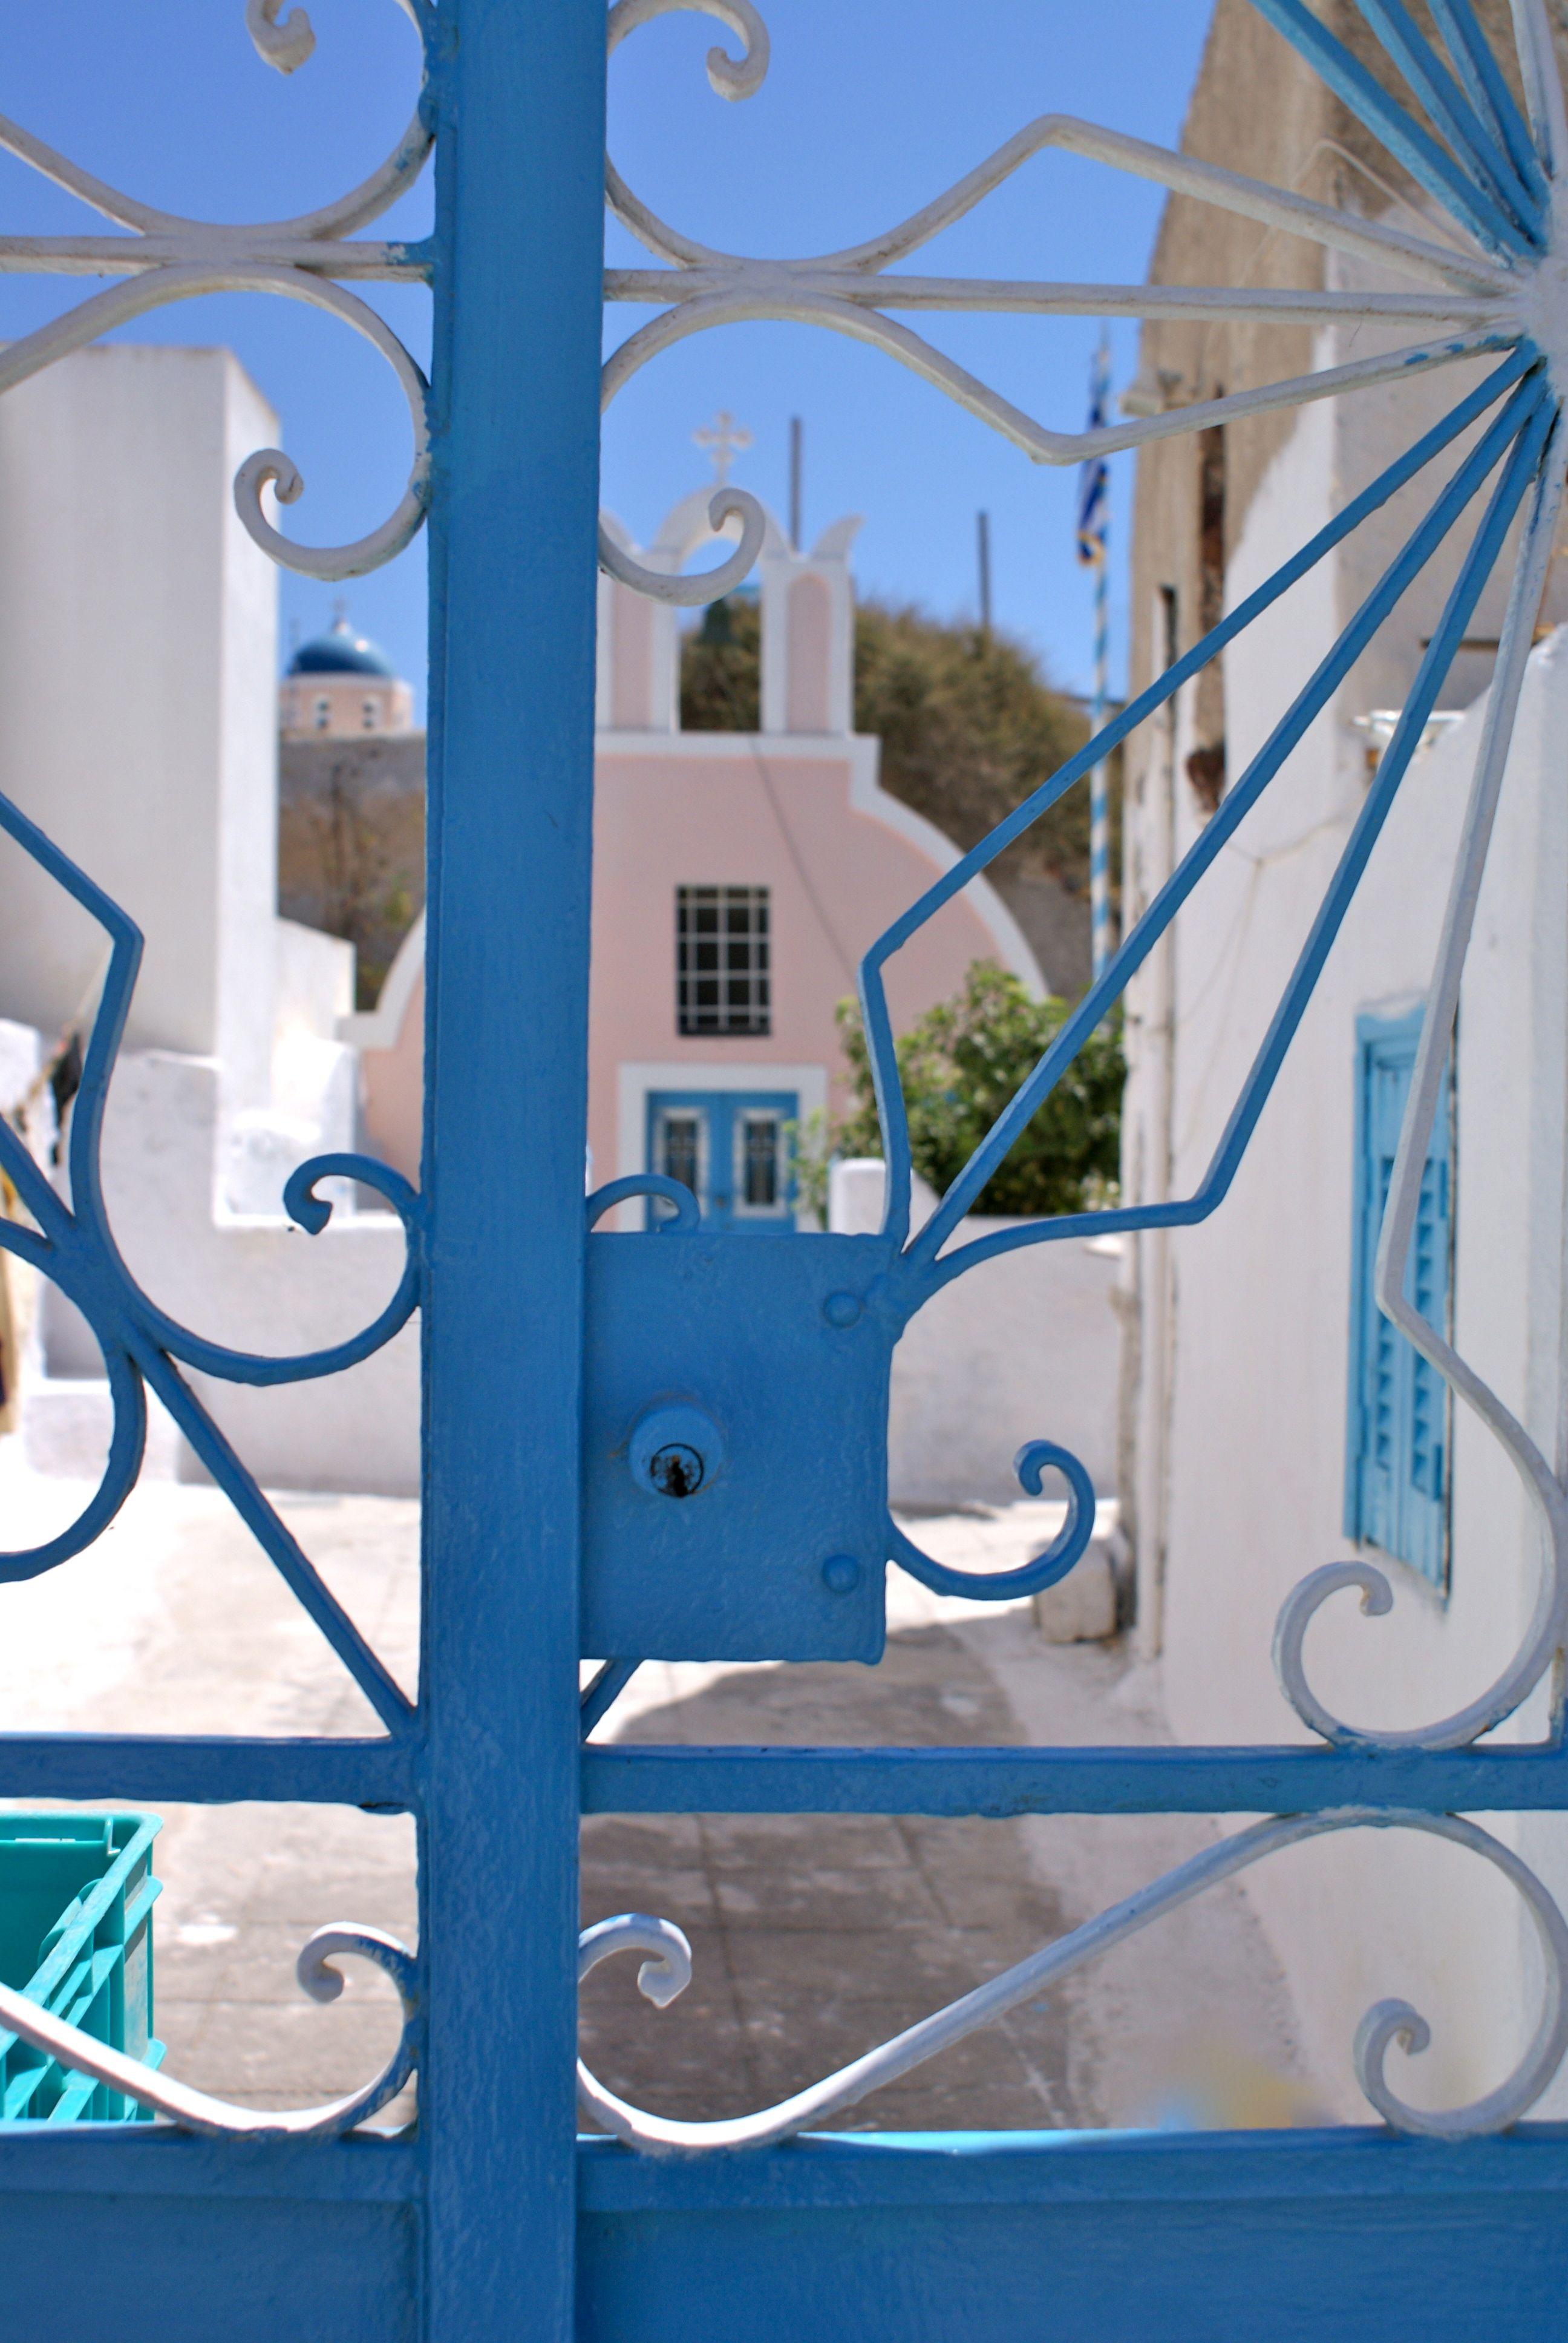 Entrance to paradise!